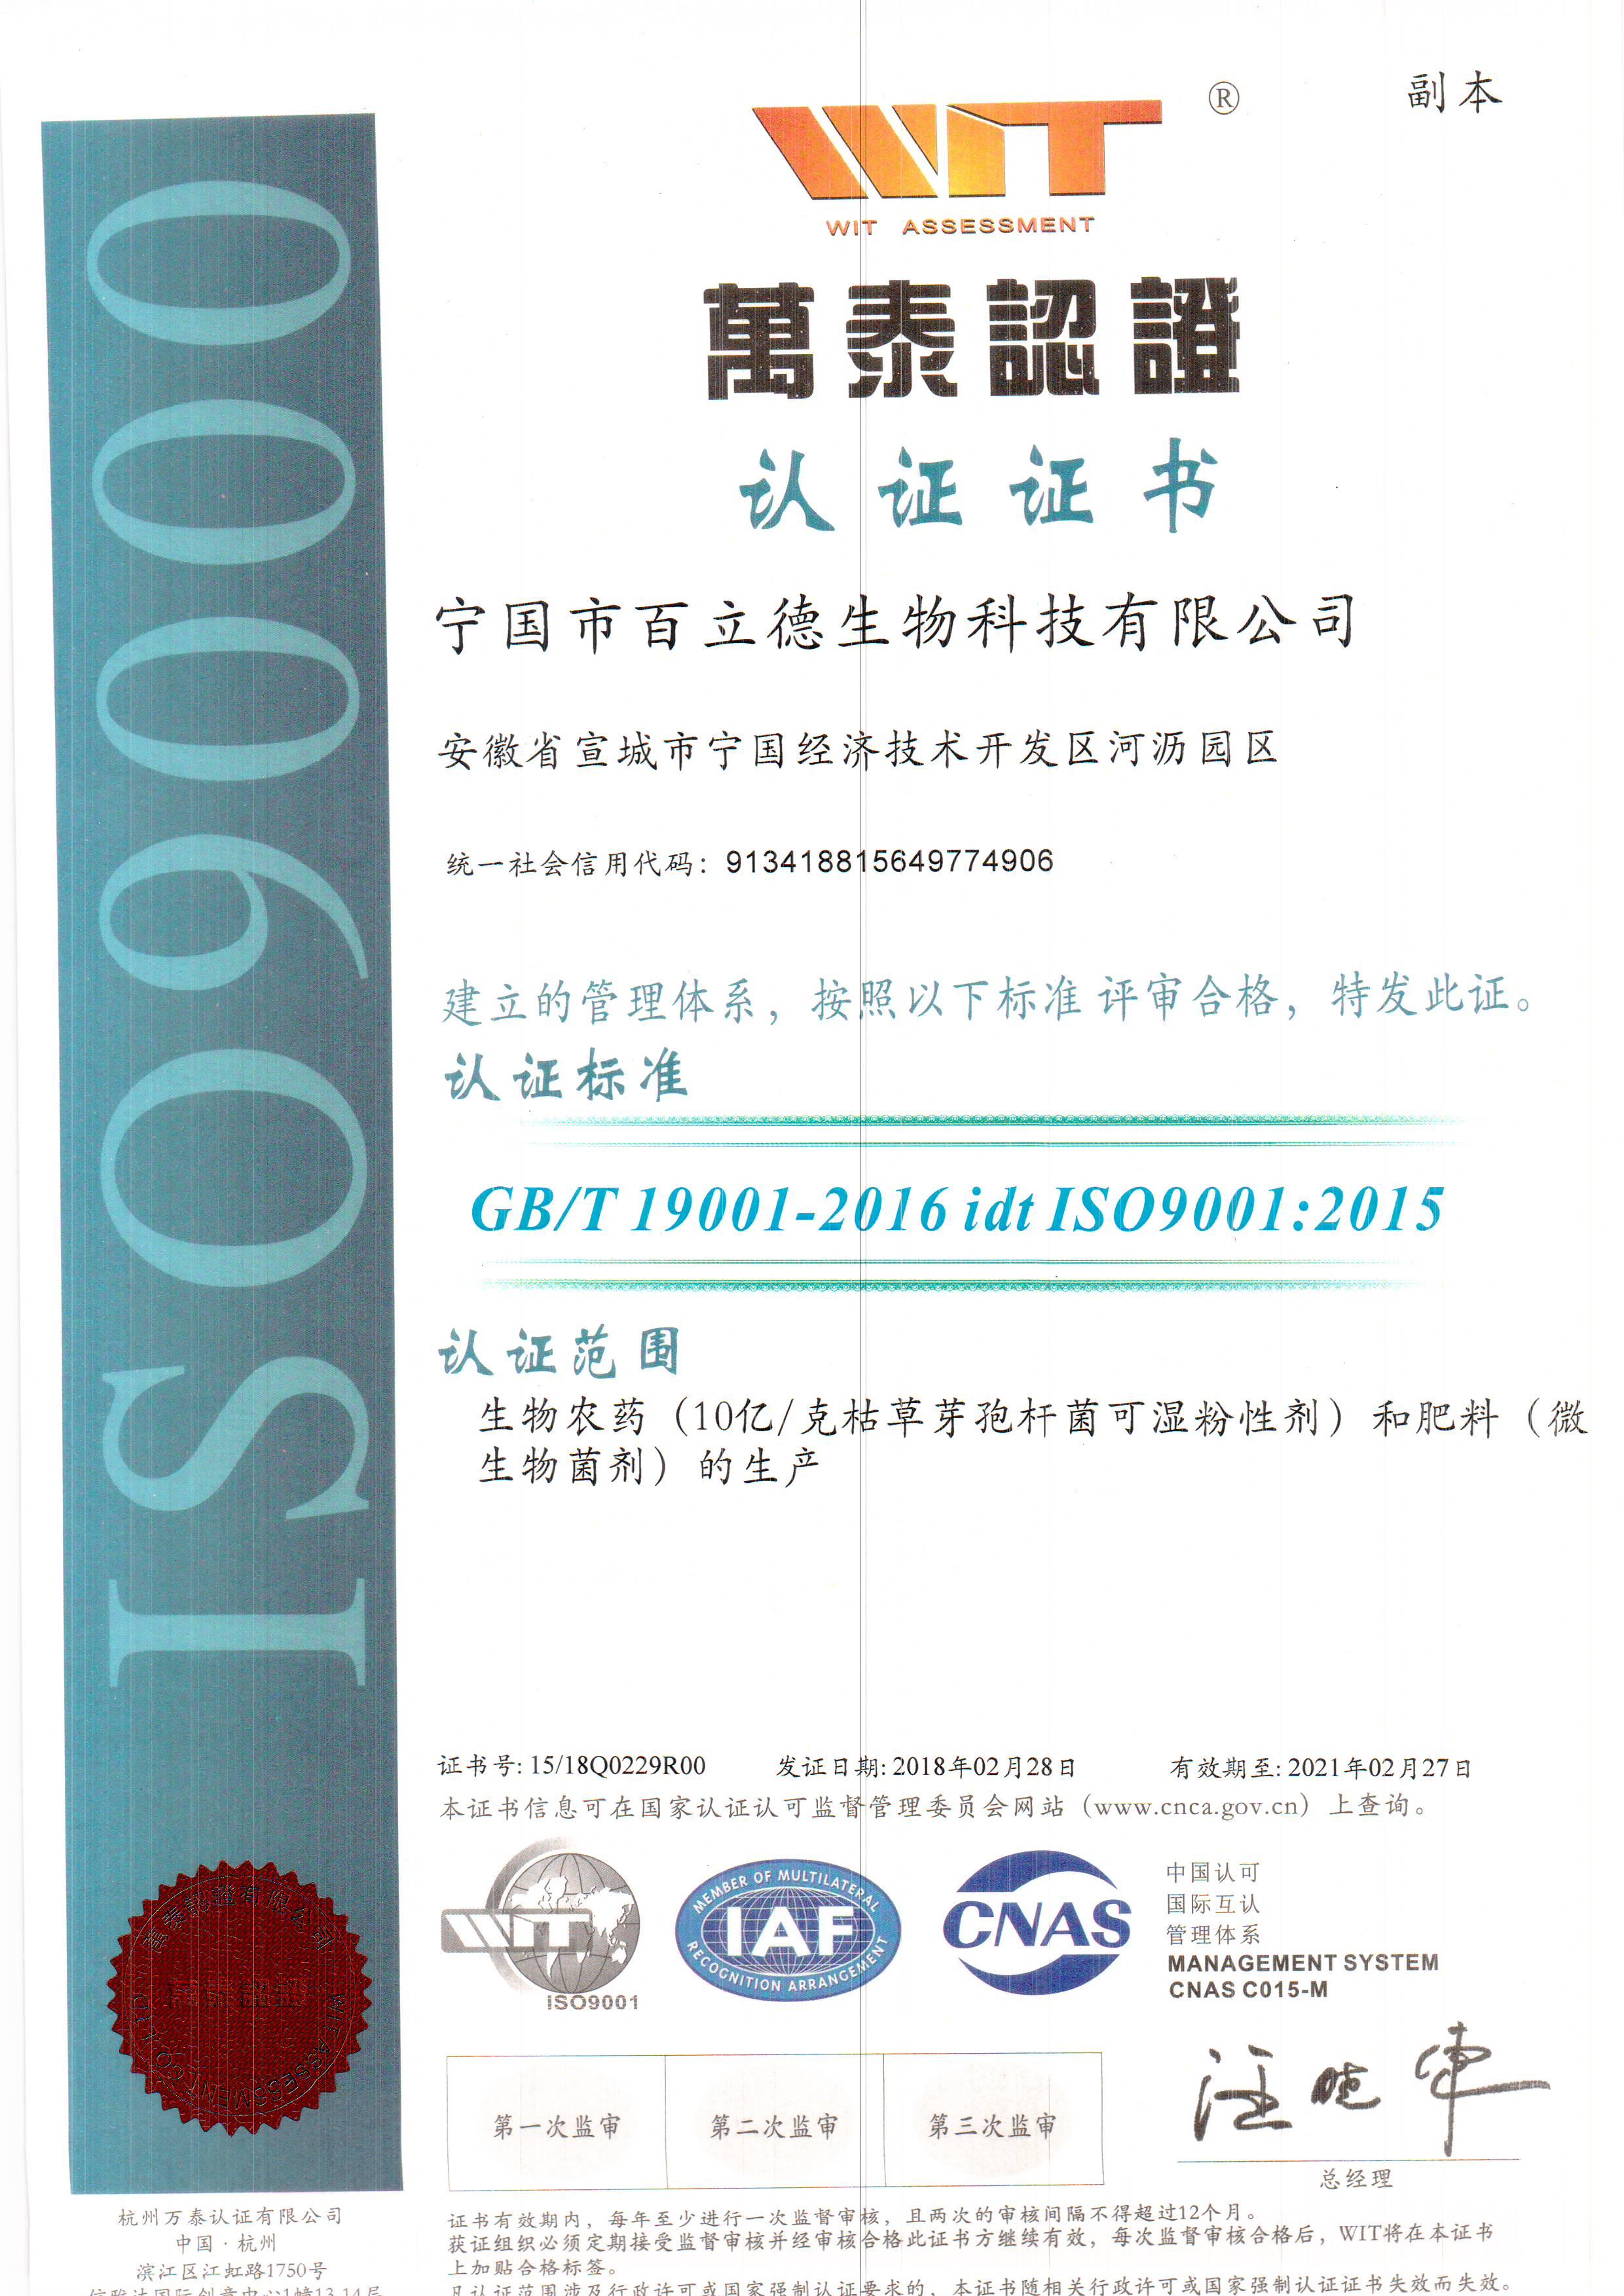 20180228副本10億枯草和肥料ISO9001:2015